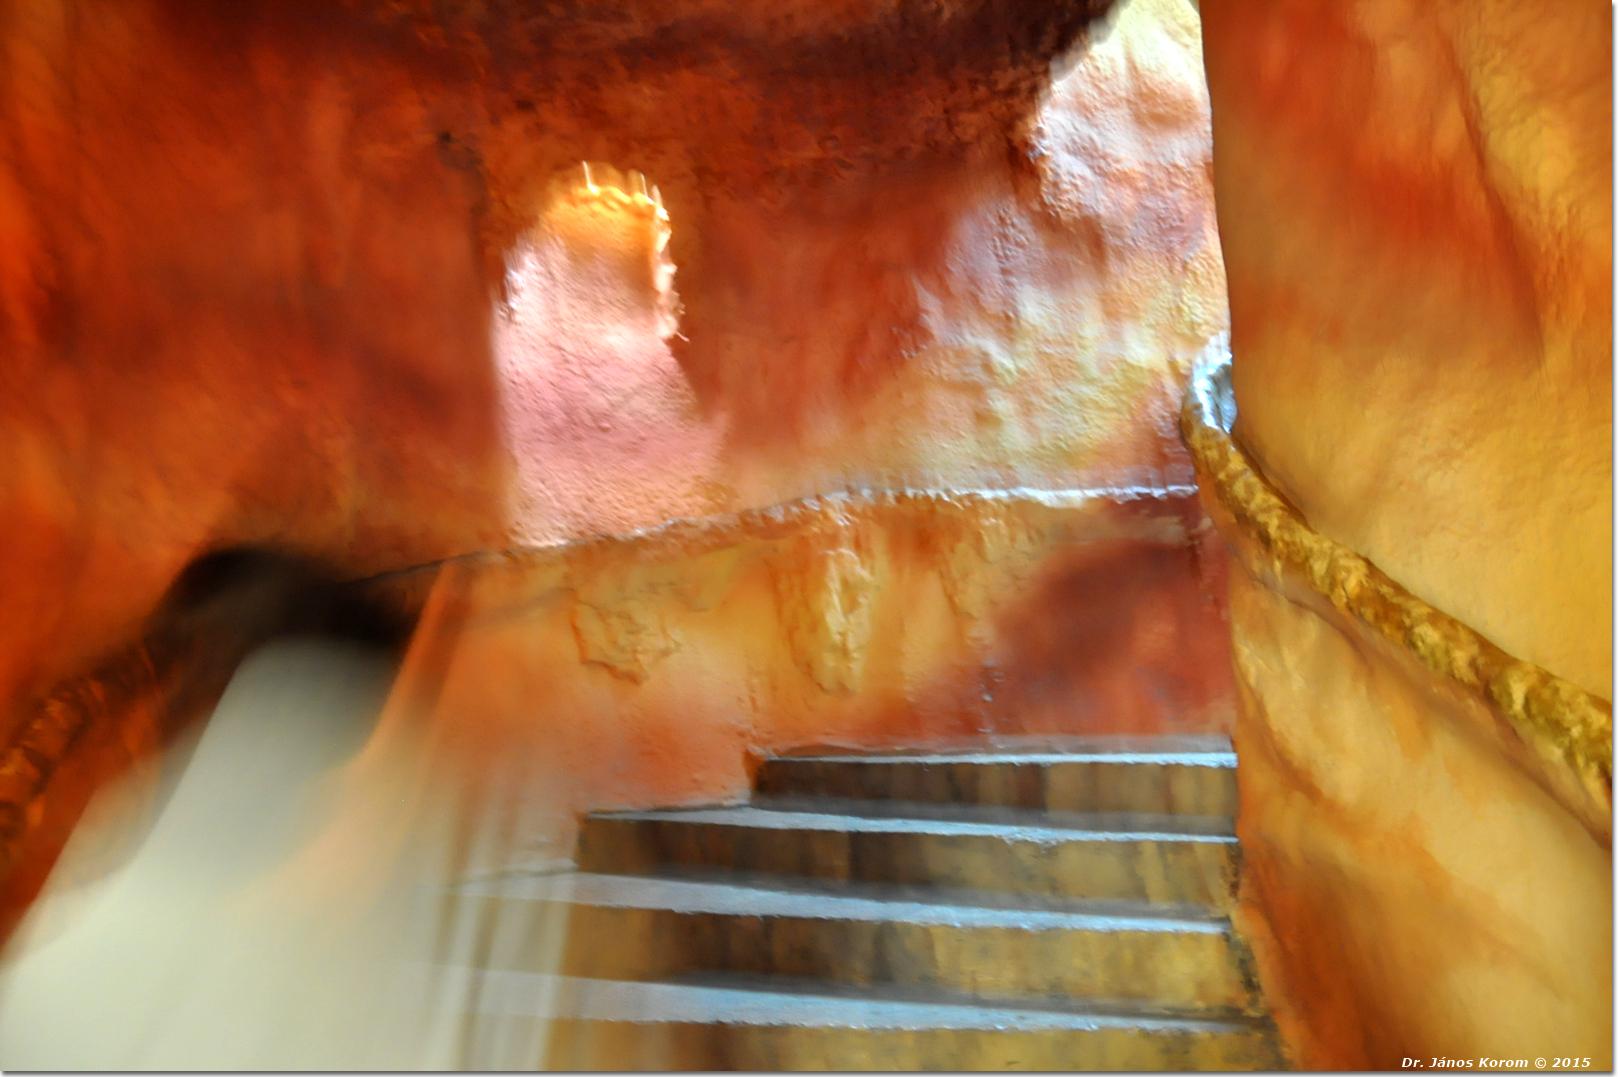 Treppenaufgang ins Licht